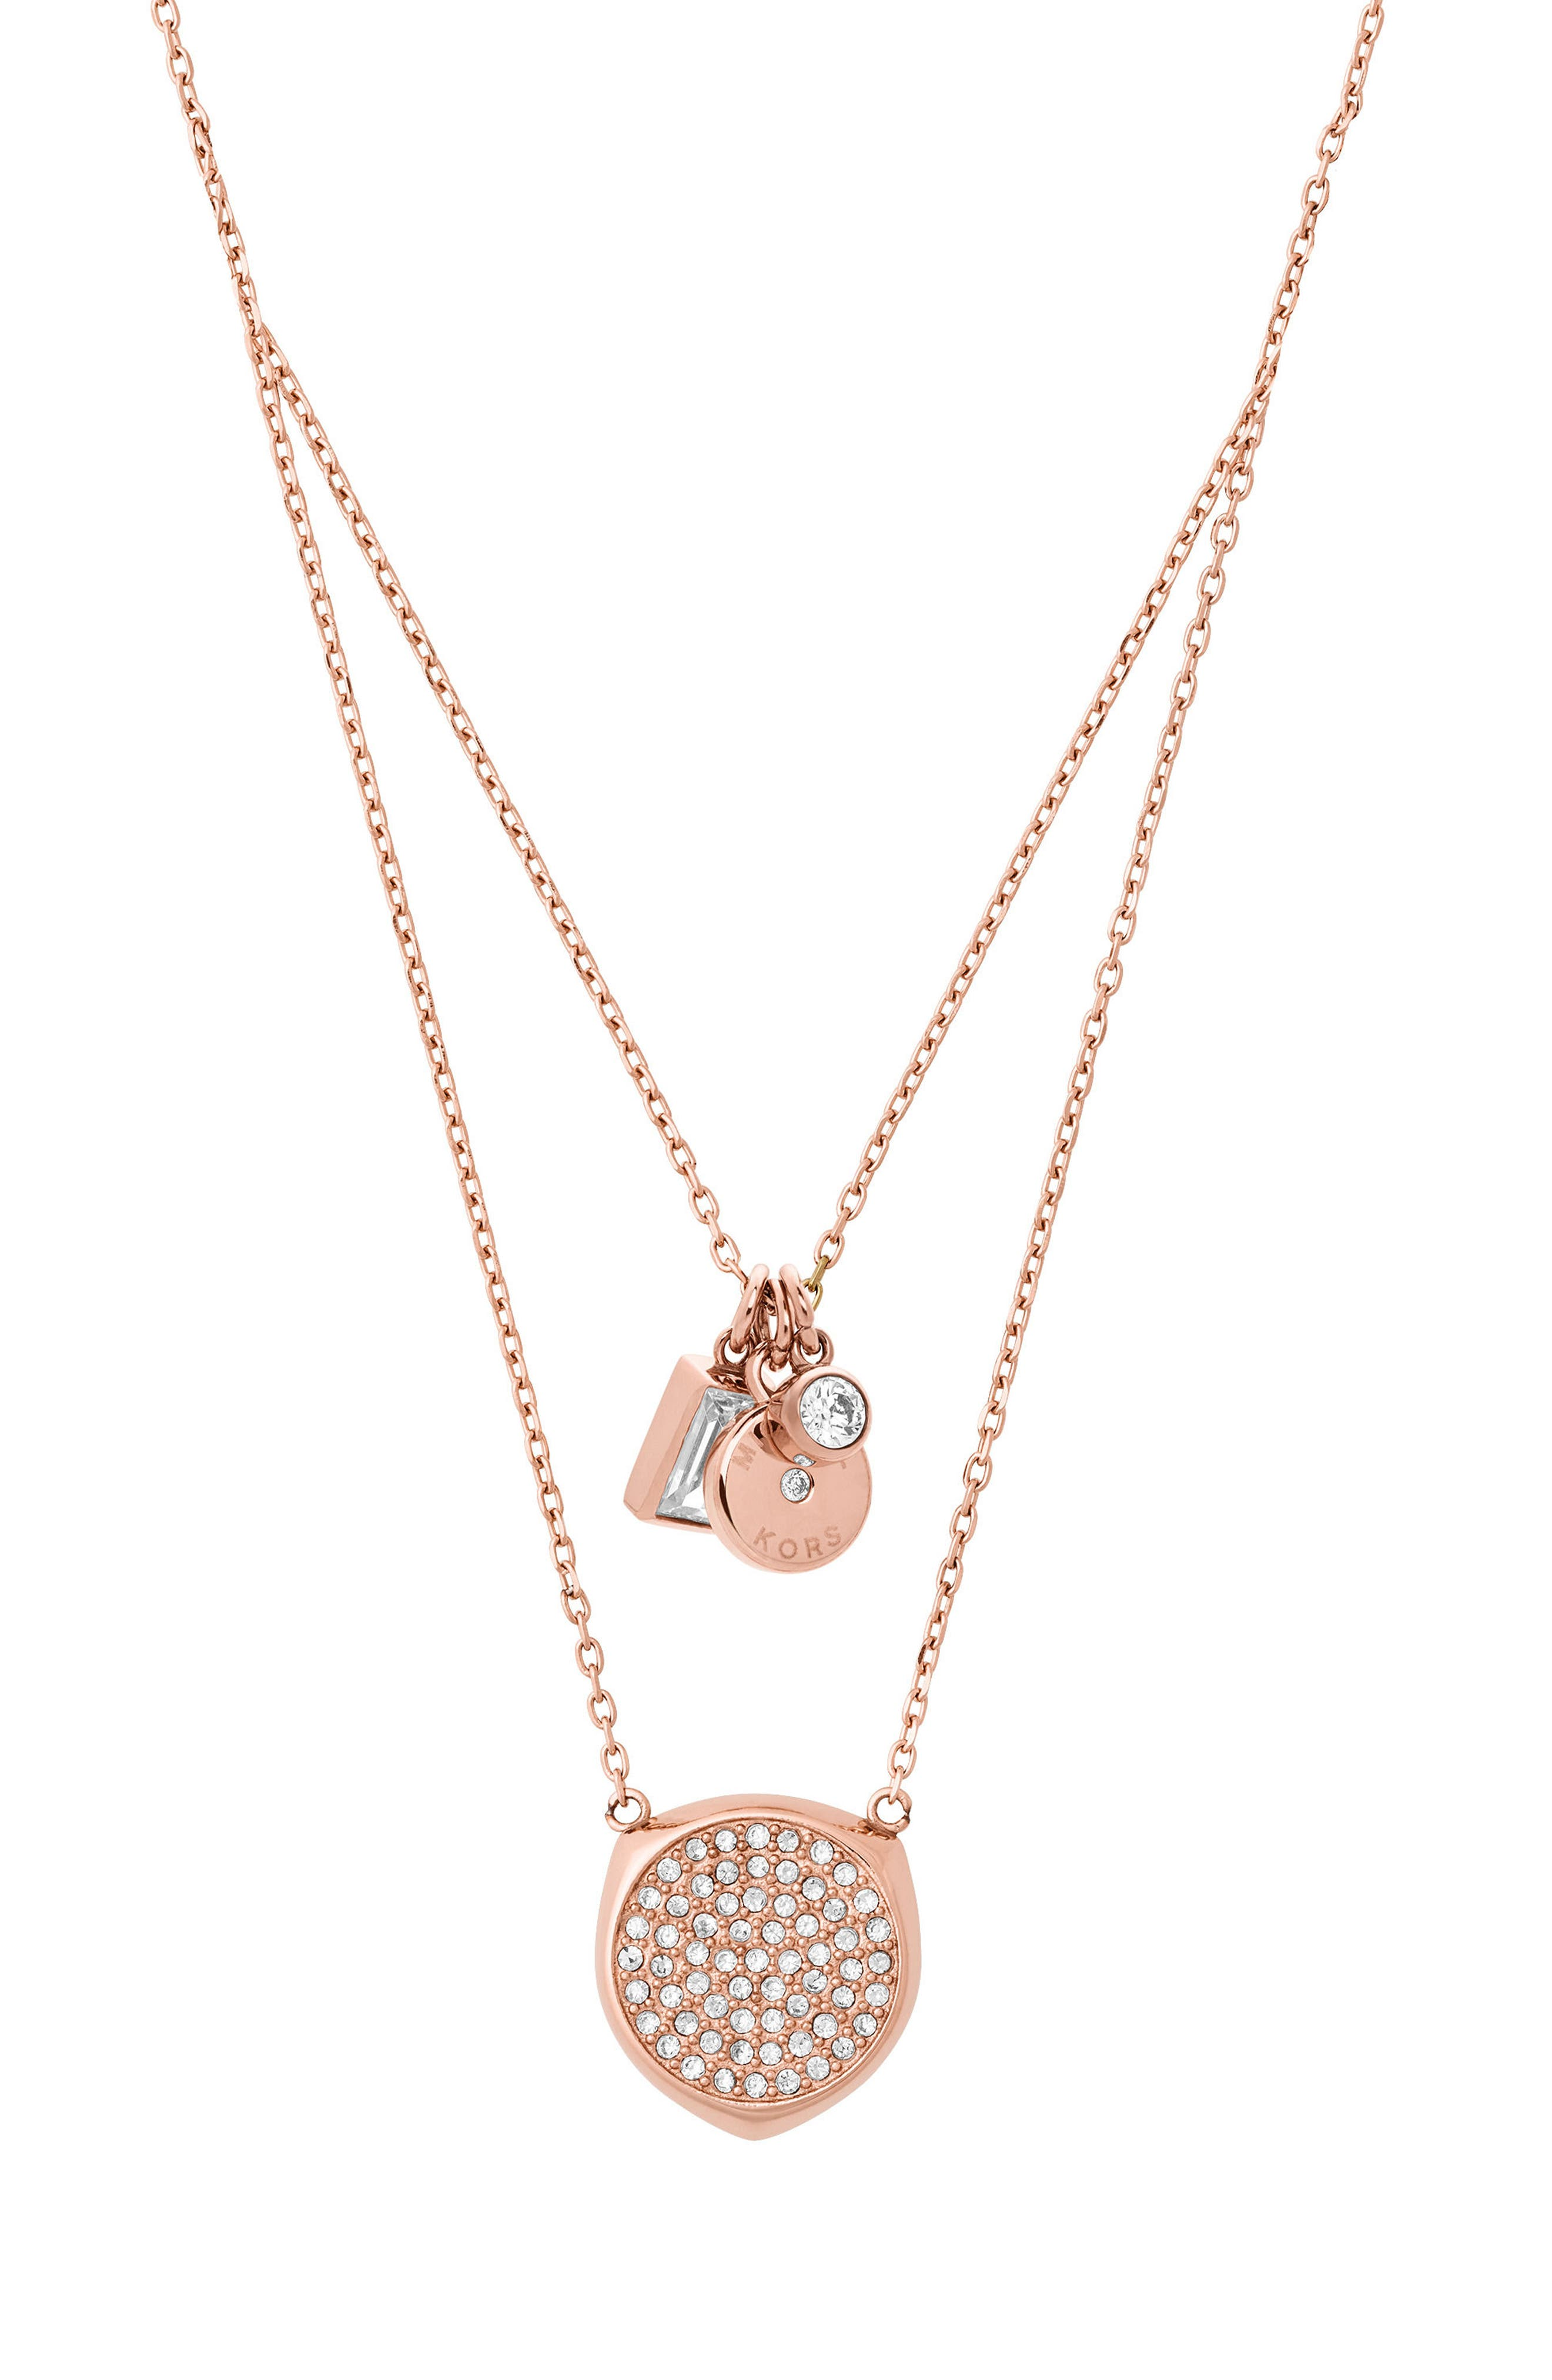 Charm Pendant Necklace,                             Alternate thumbnail 2, color,                             Rose Gold